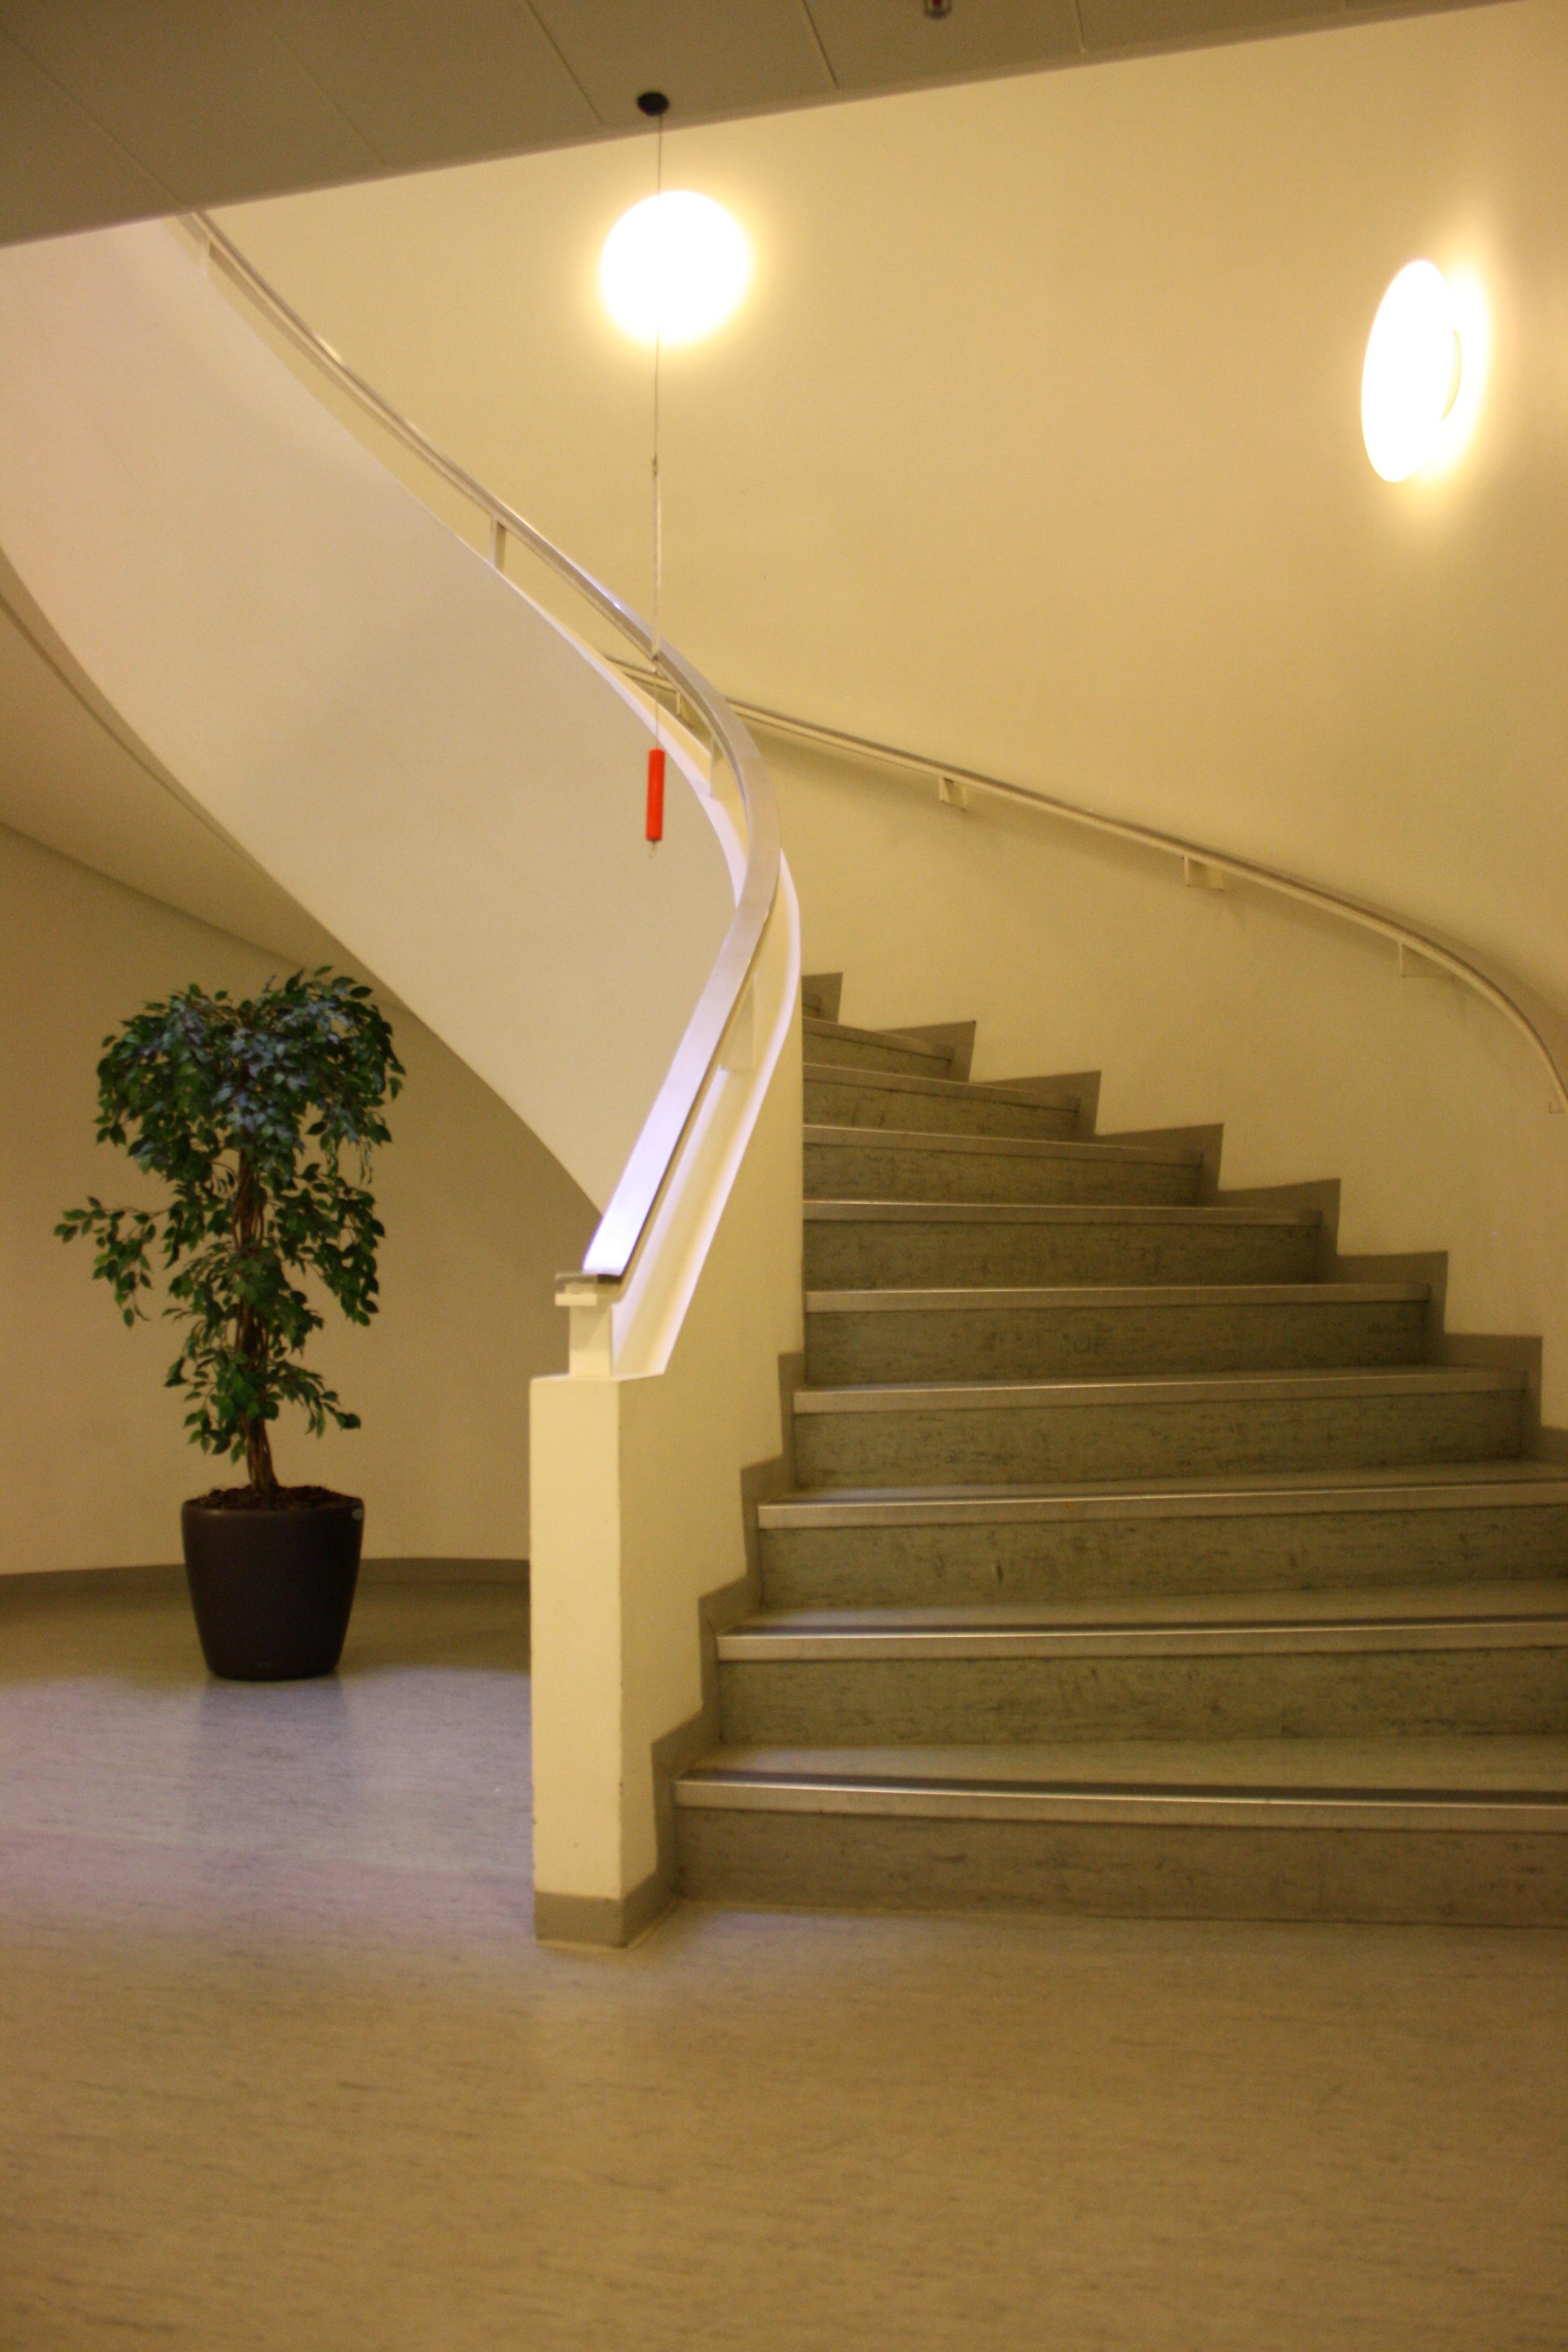 rigshospital-1554976611-60.jpg